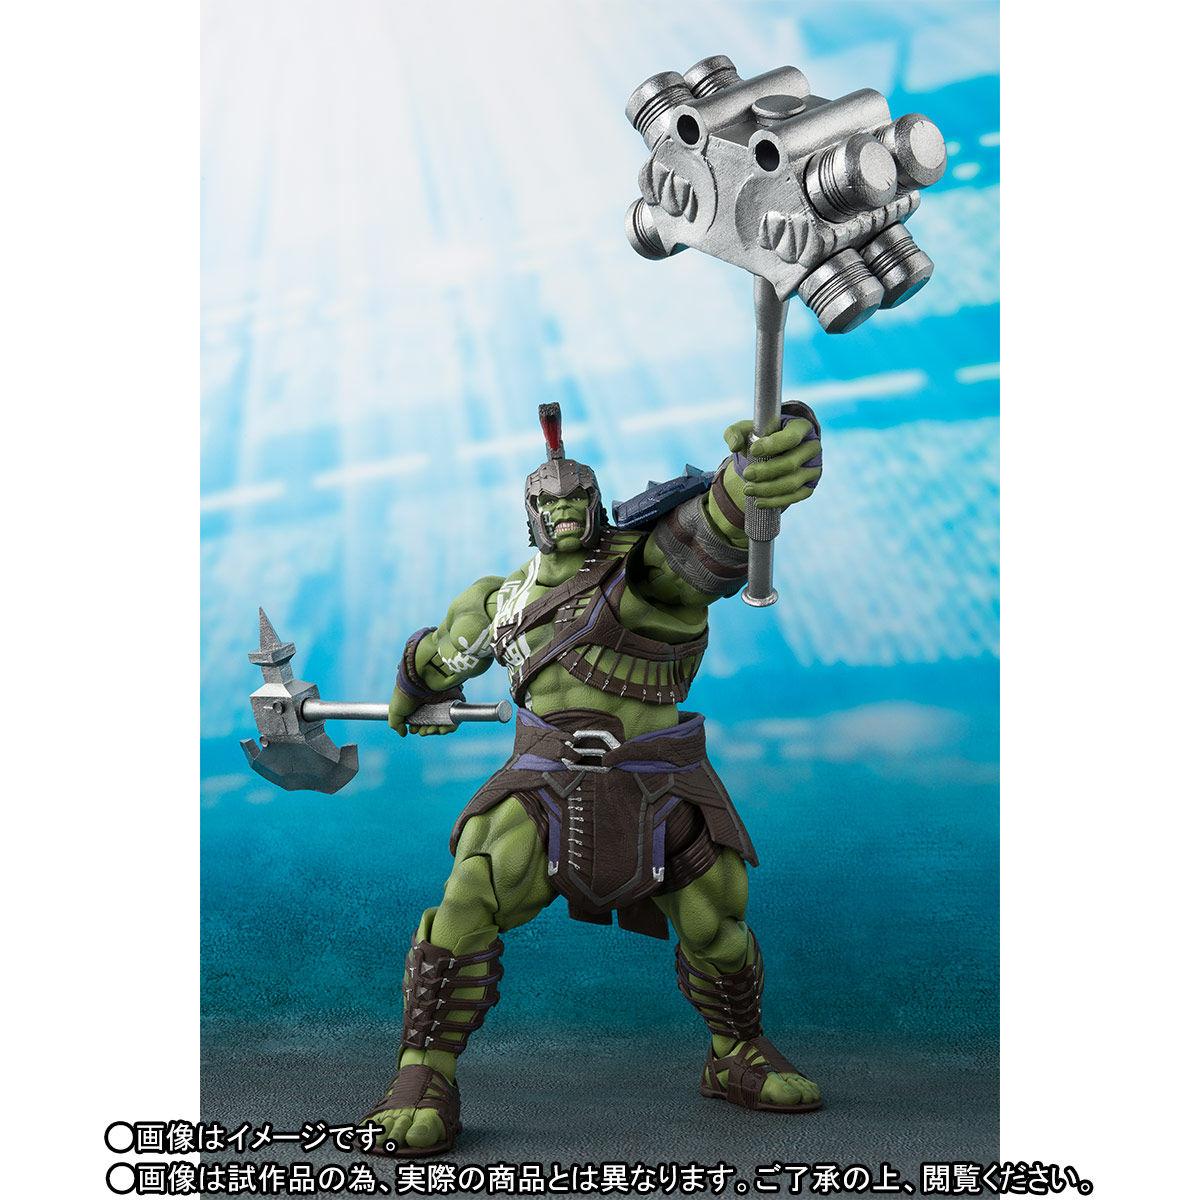 SH-Figuarts-Gladiator-Hulk-007